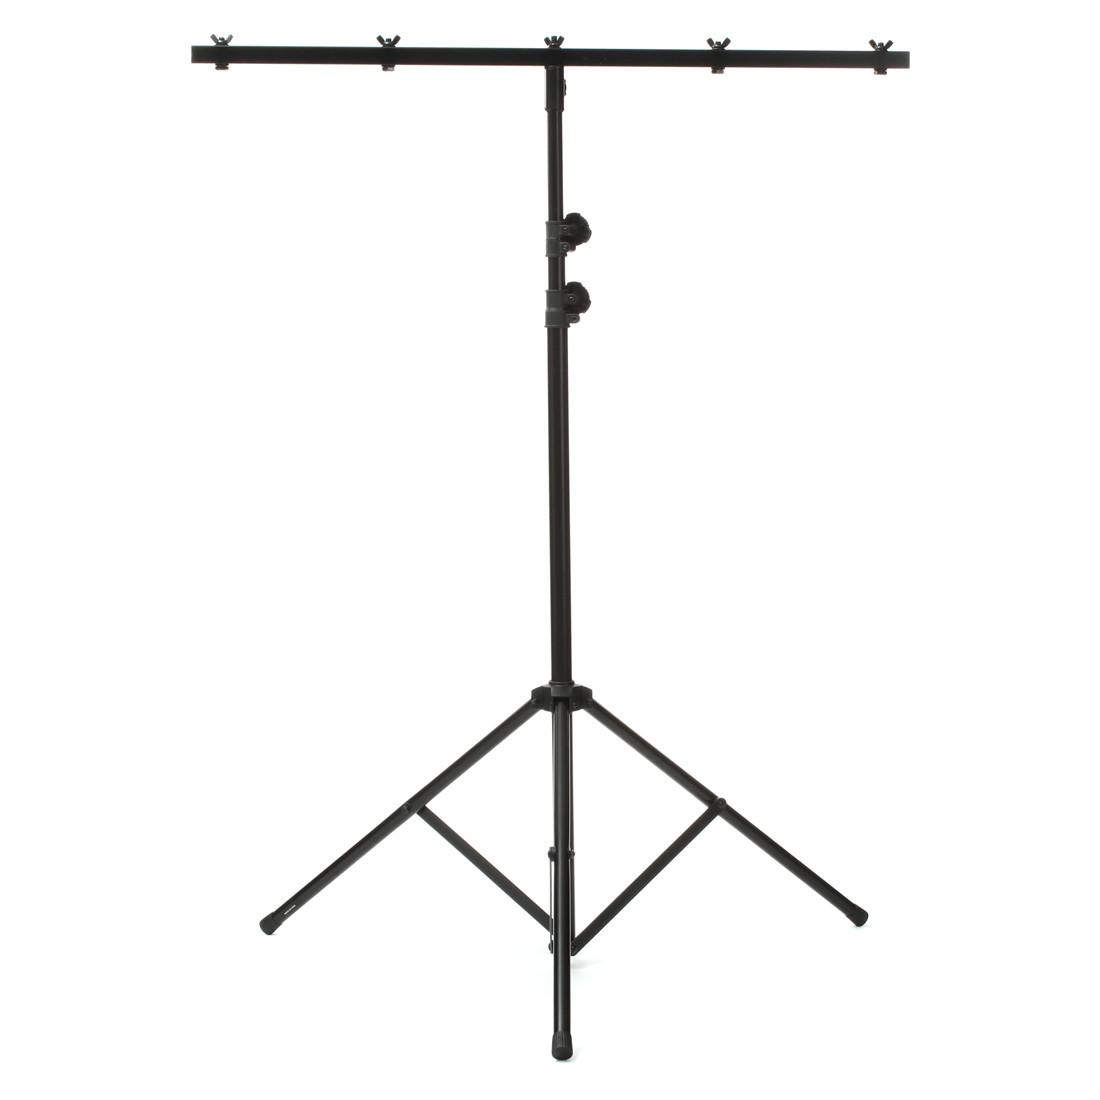 lts-6 lighting stand - stands light